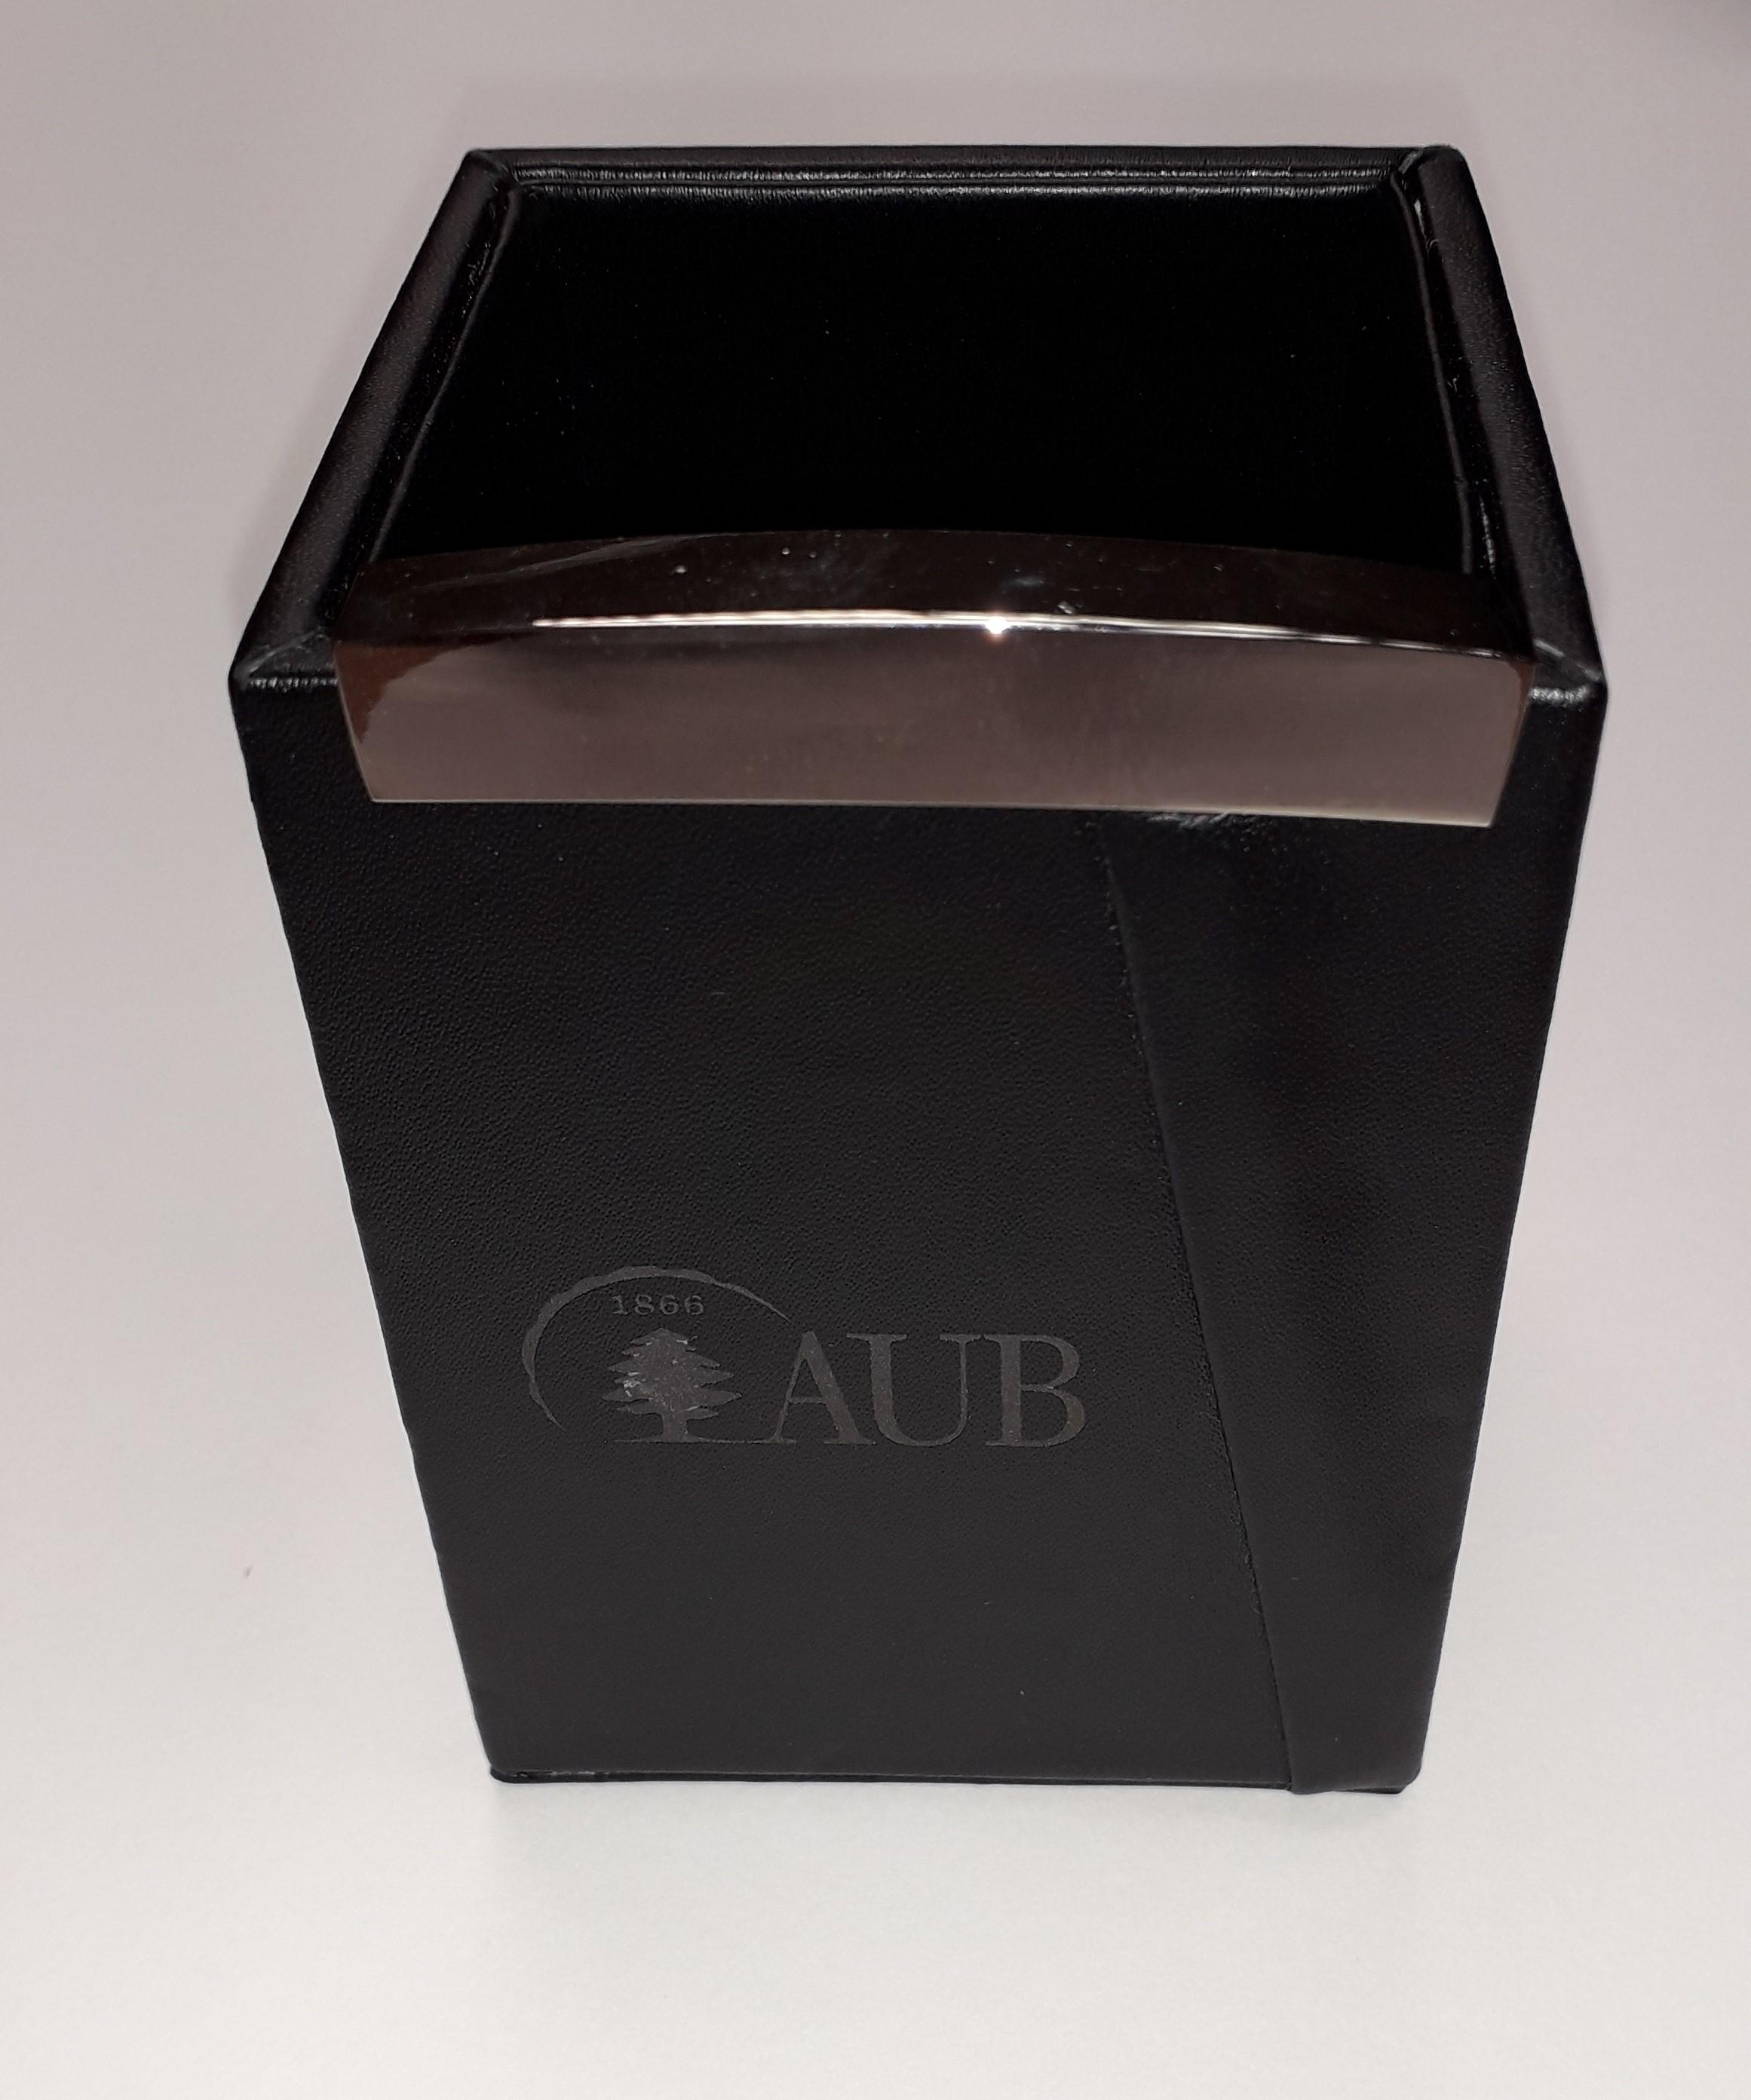 AUB Leather Pen Holder Hard Black